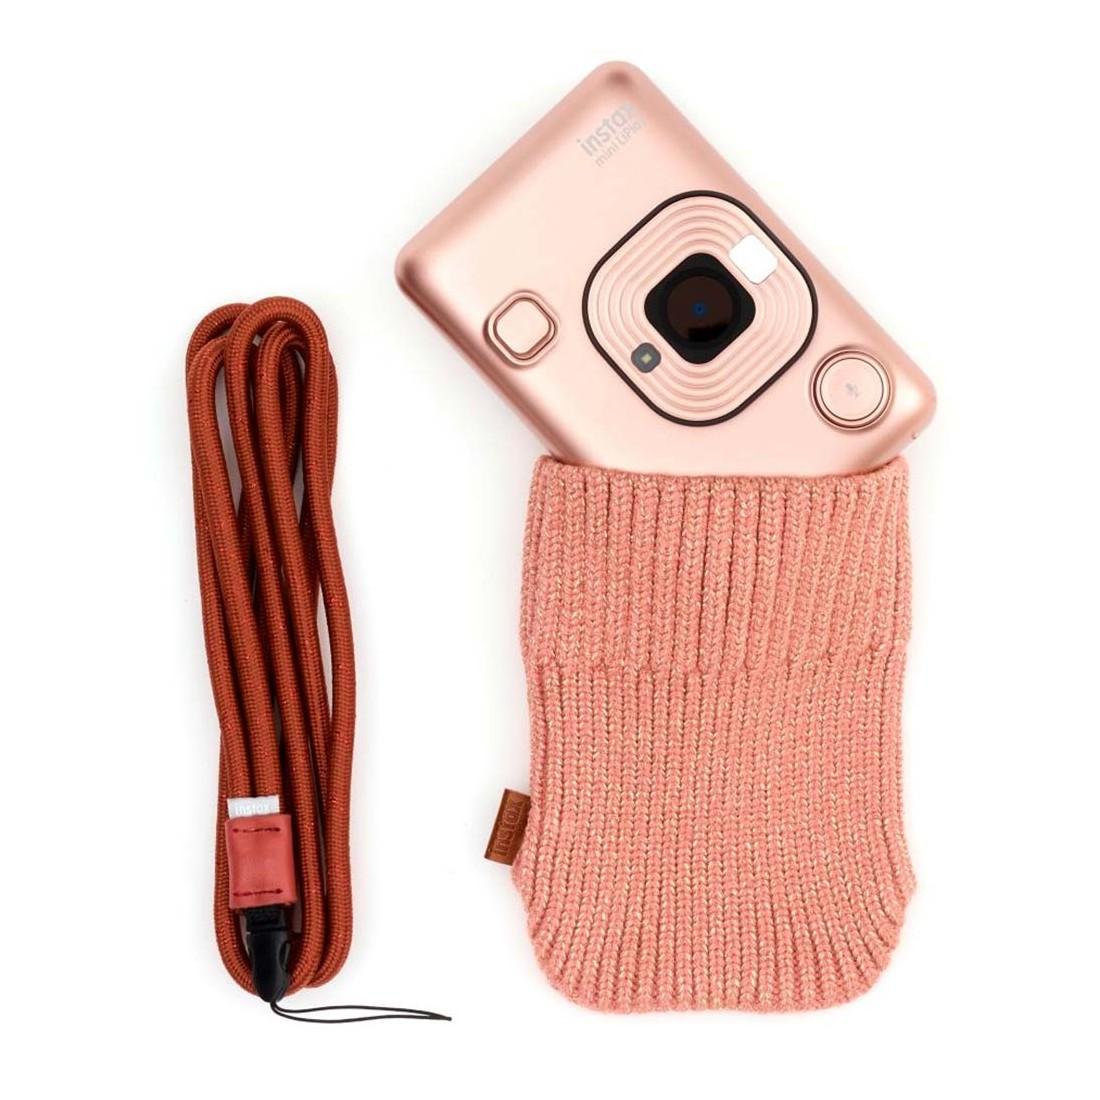 Cámara Fujifilm Instax Mini LiPlay Elegant + correa + funda, color Dorado